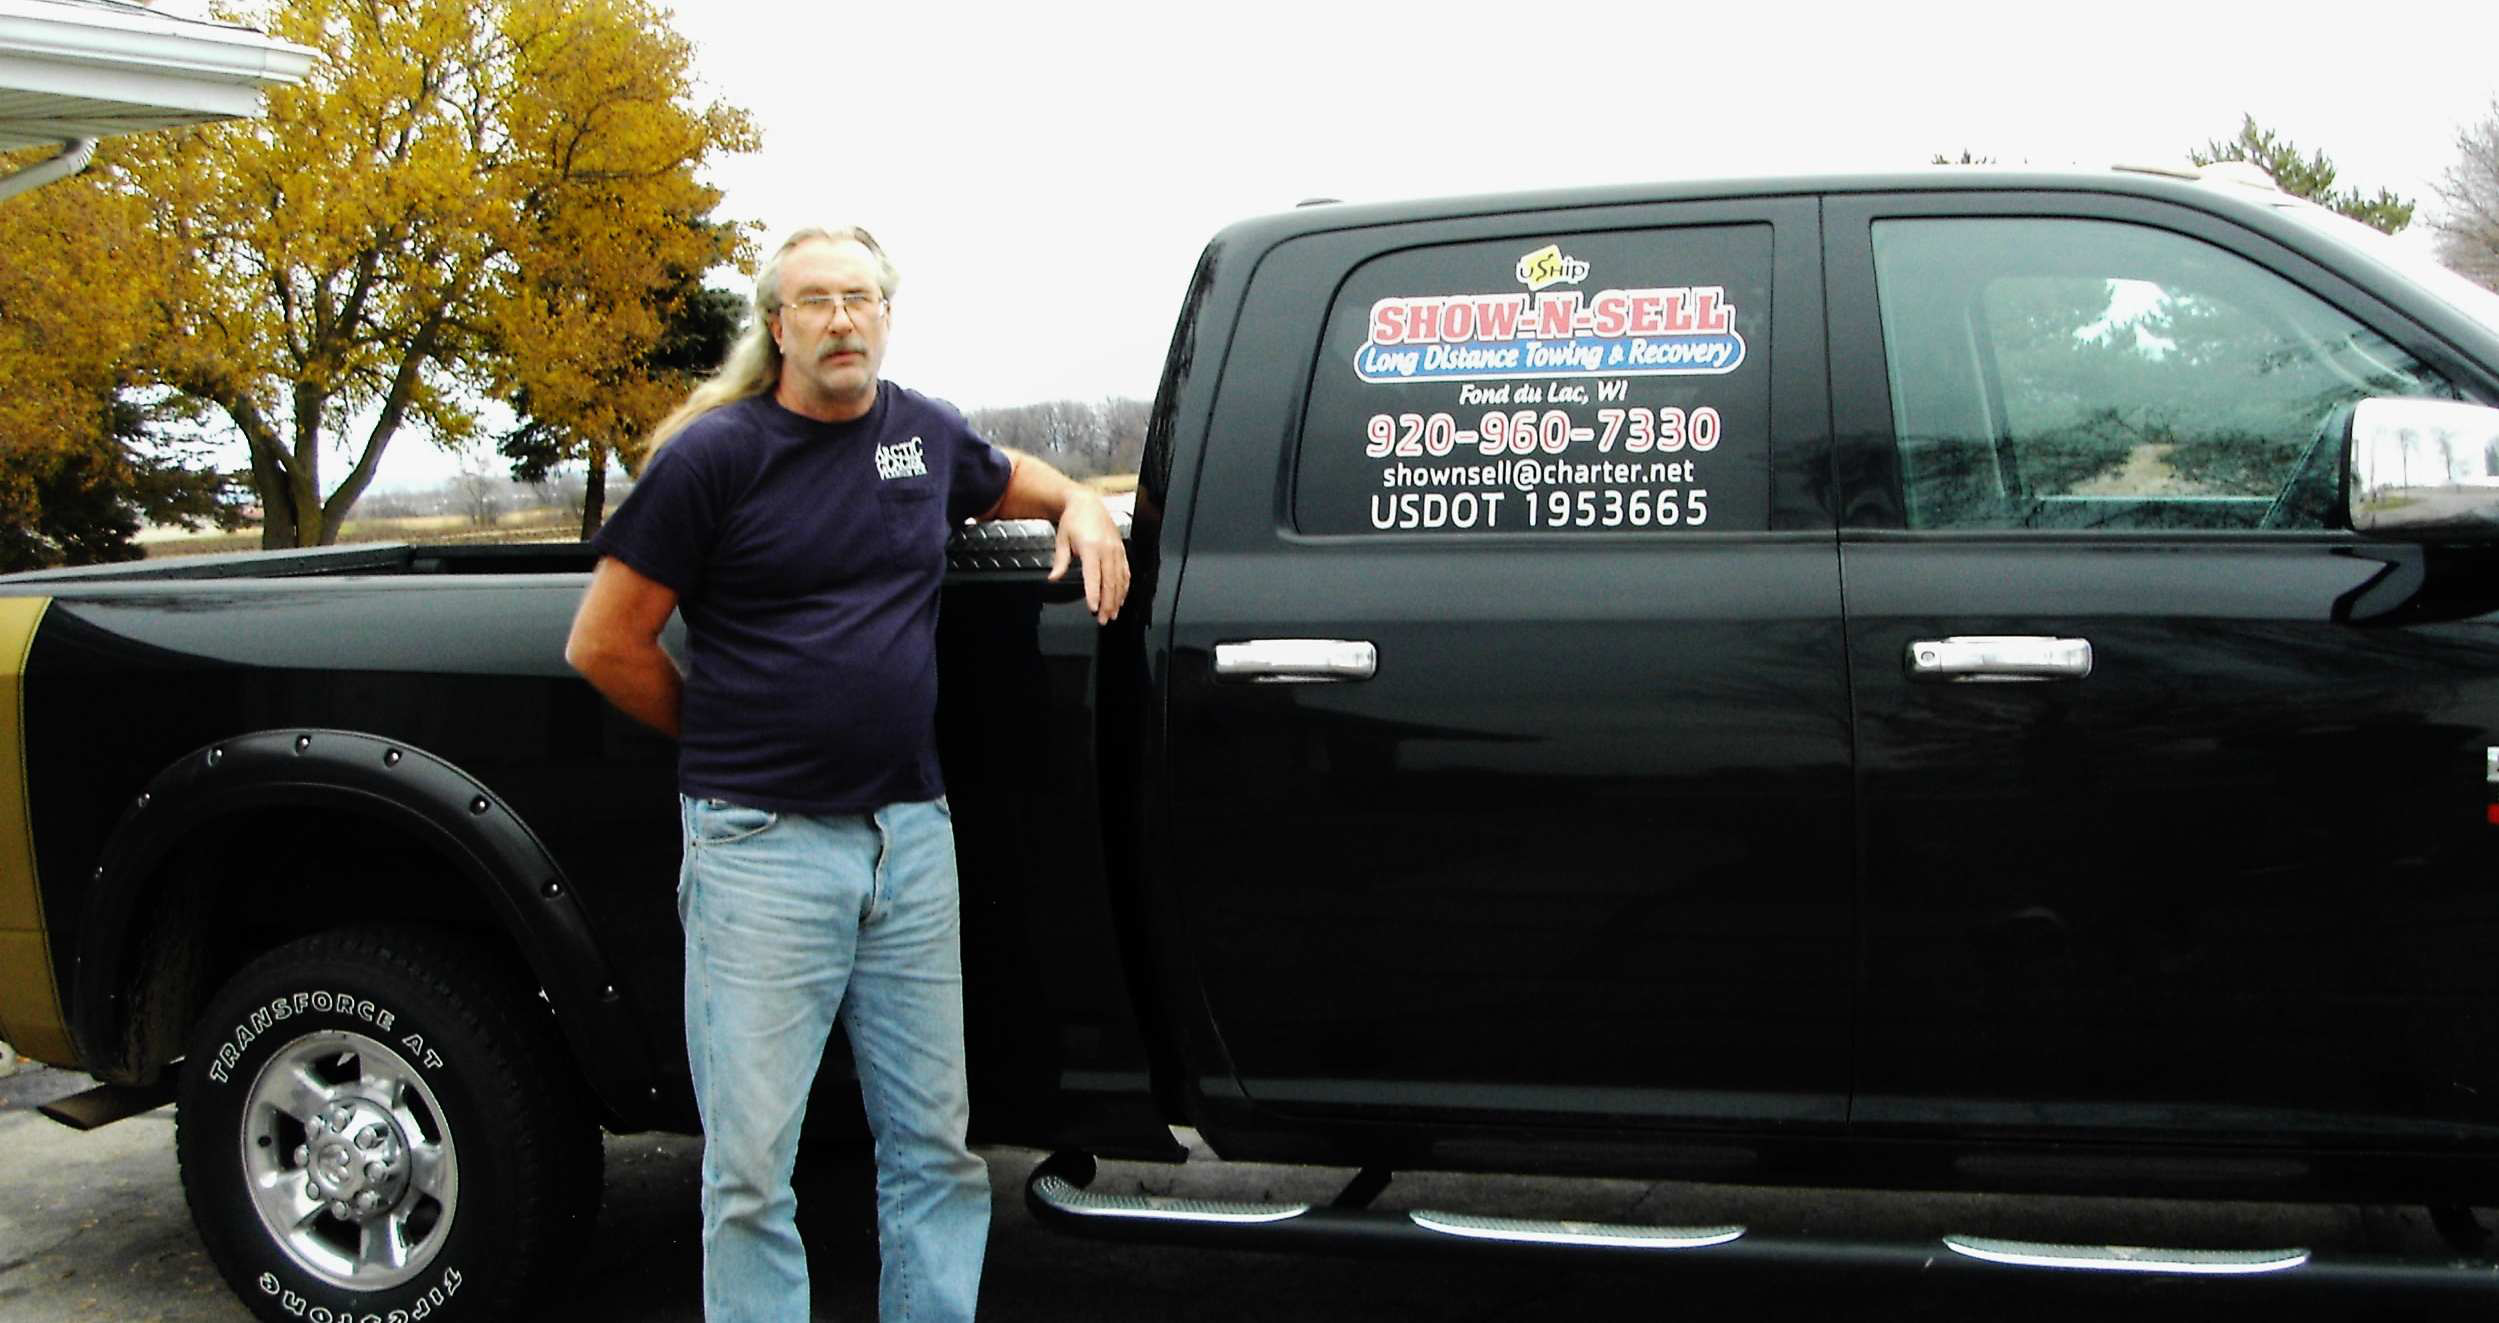 Car/mobile equipment hauling: Owner-operator Greg Cutler\'s Show-n ...